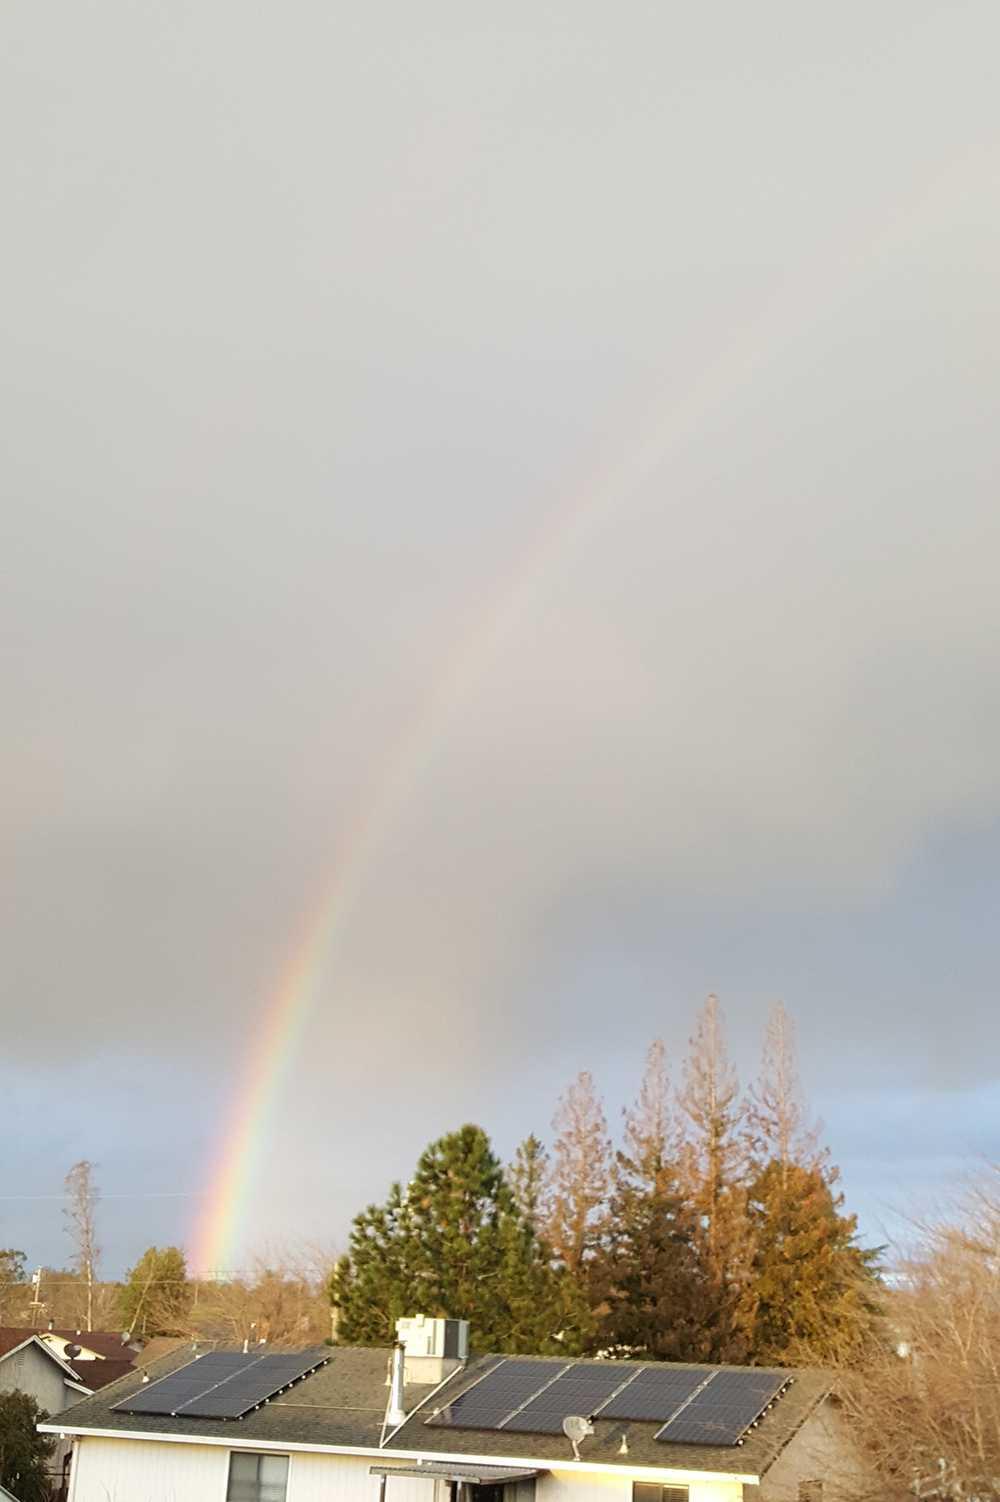 Cheryl Boring took this photo of a rainbow on Monday, Jan. 23, 2017.